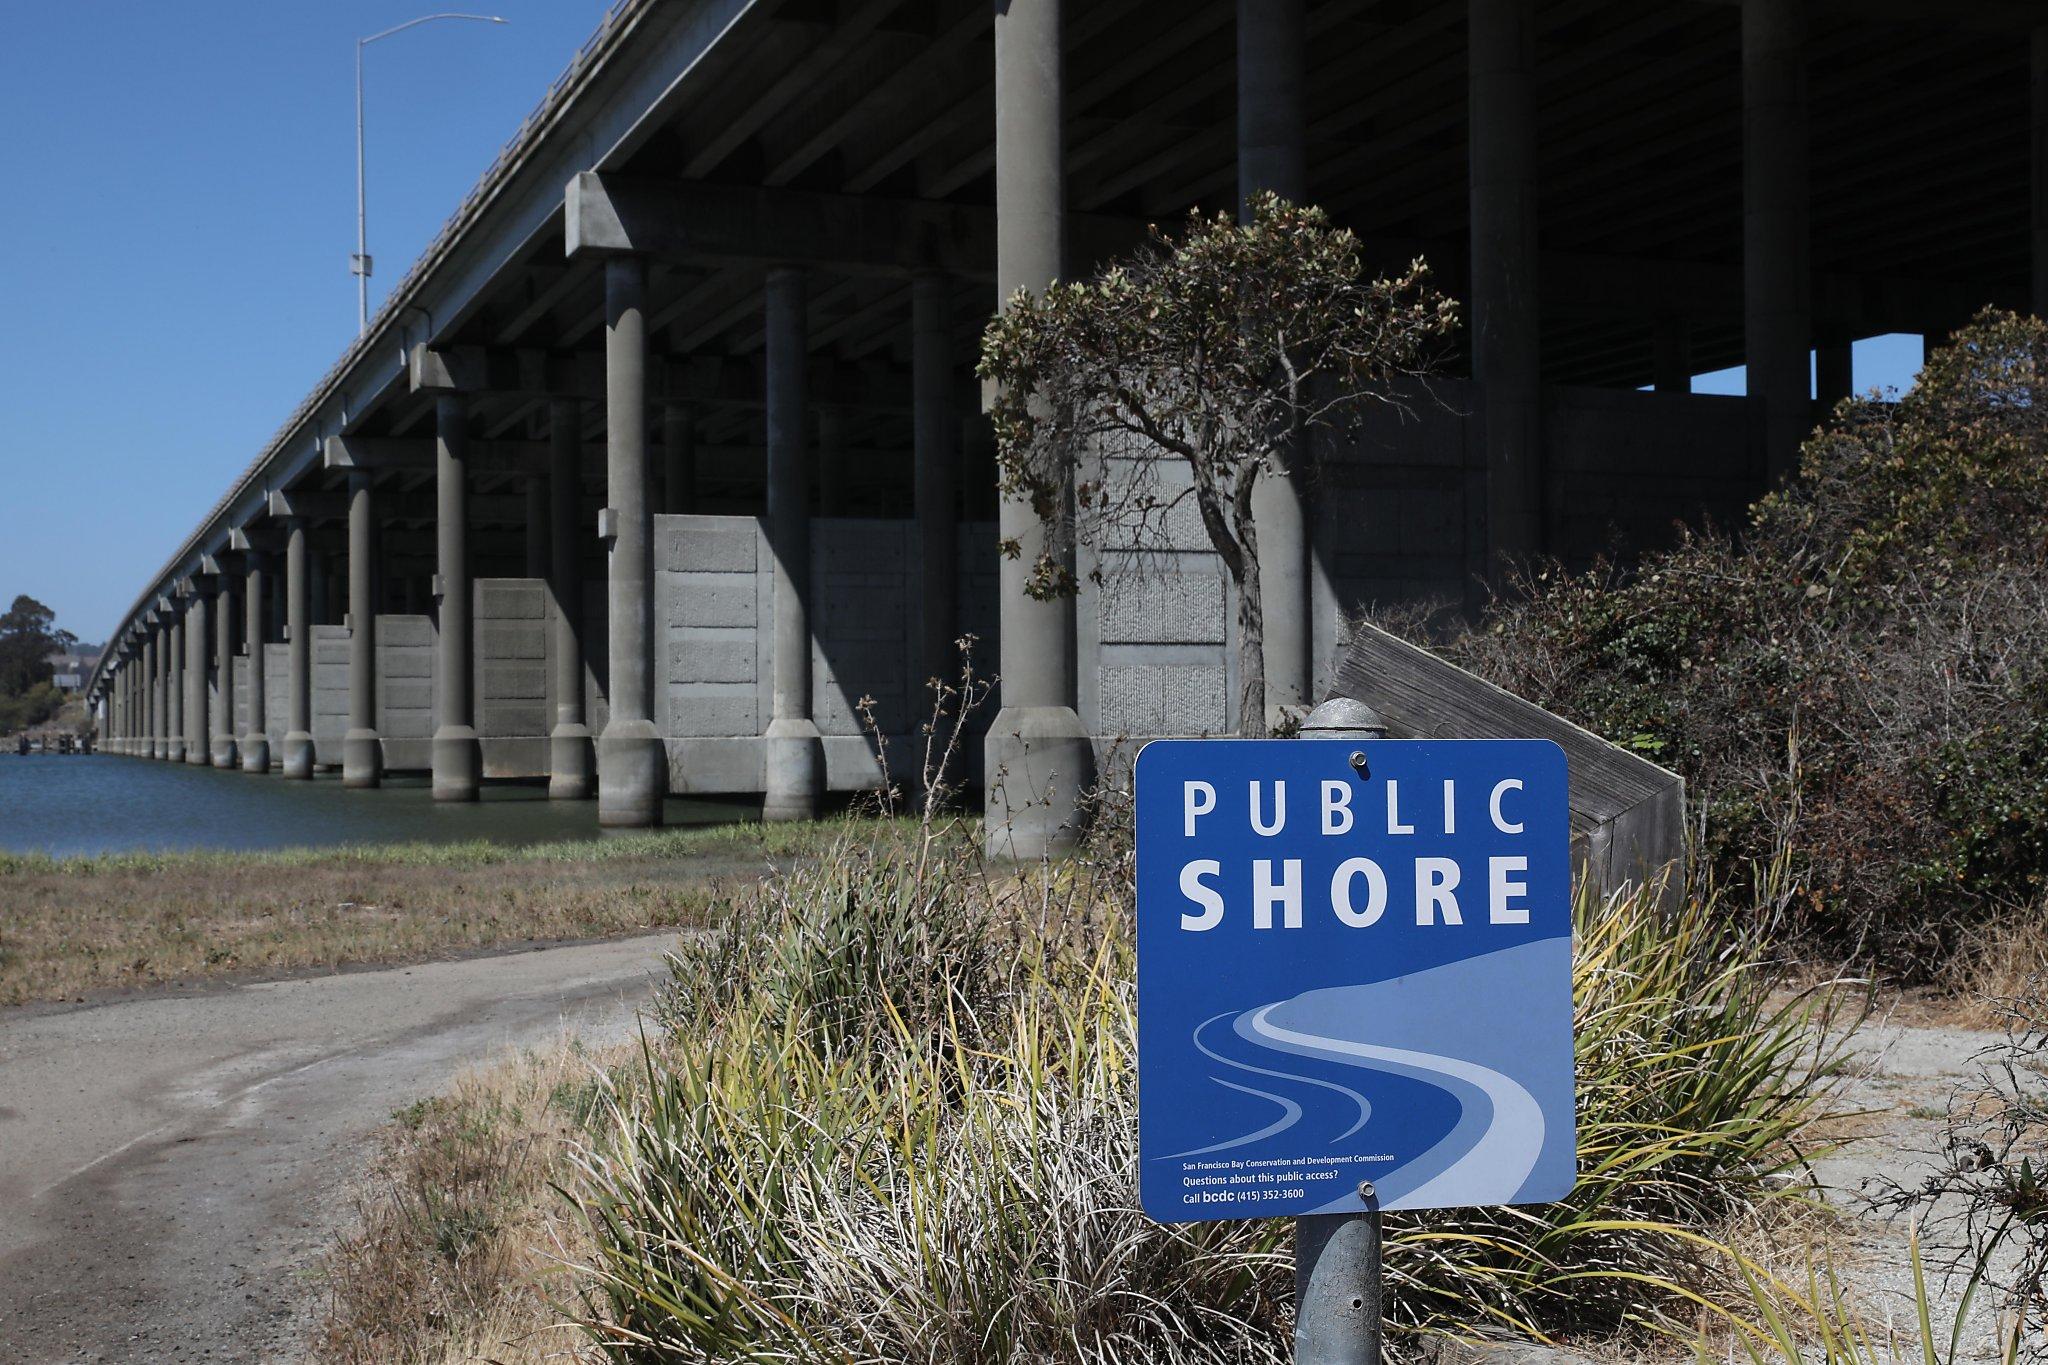 Sea level rise to choke Bay Area traffic as far away as Santa Rosa, Napa, study shows